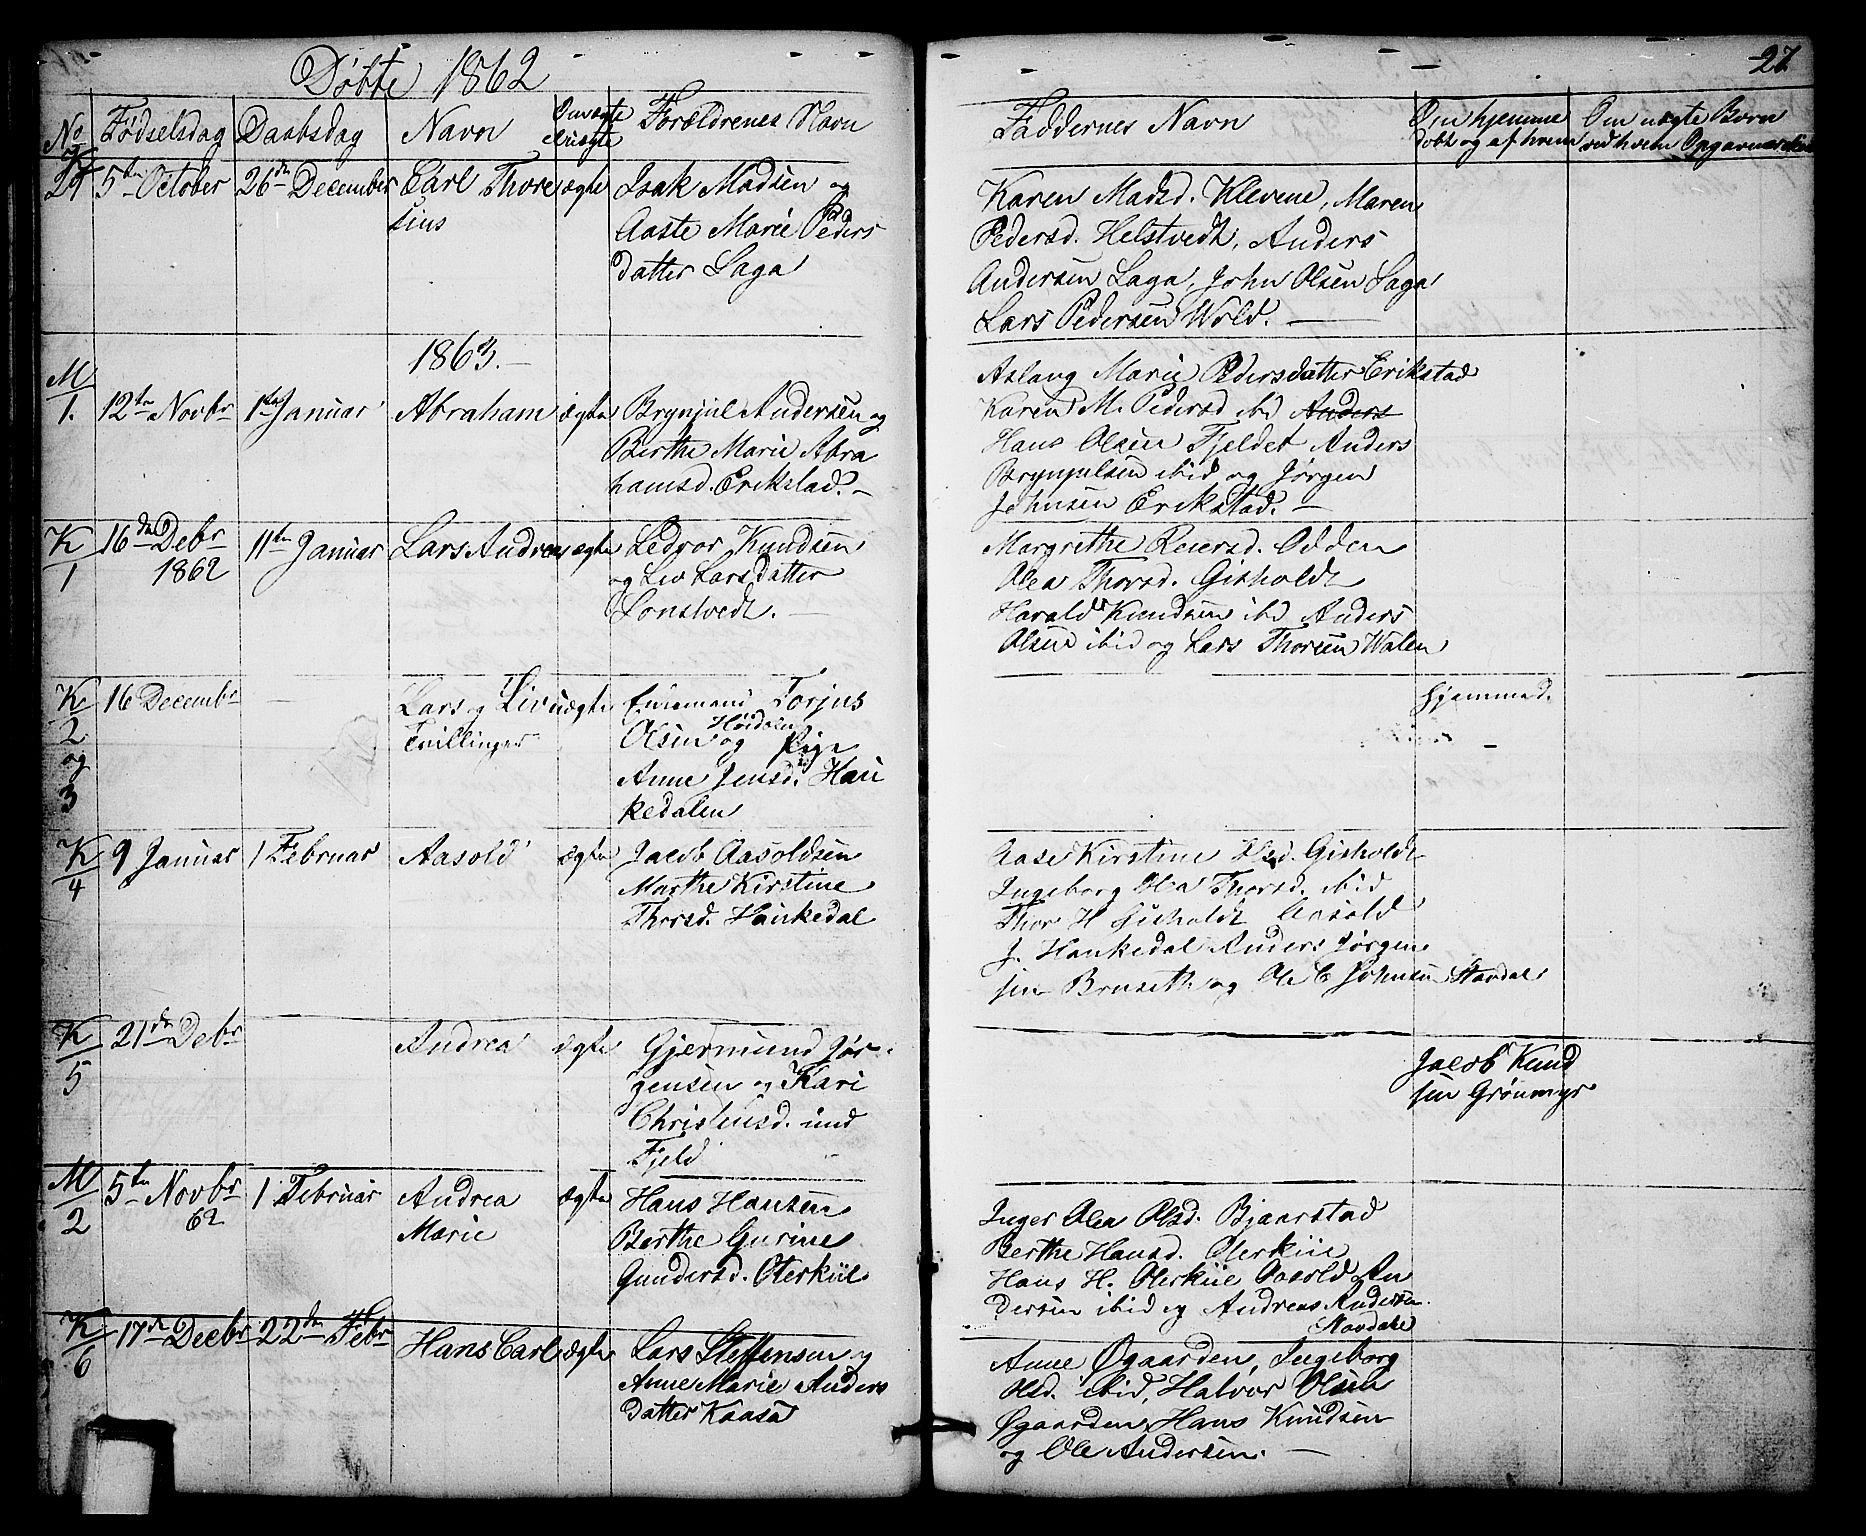 SAKO, Solum kirkebøker, G/Gb/L0002: Klokkerbok nr. II 2, 1859-1879, s. 27